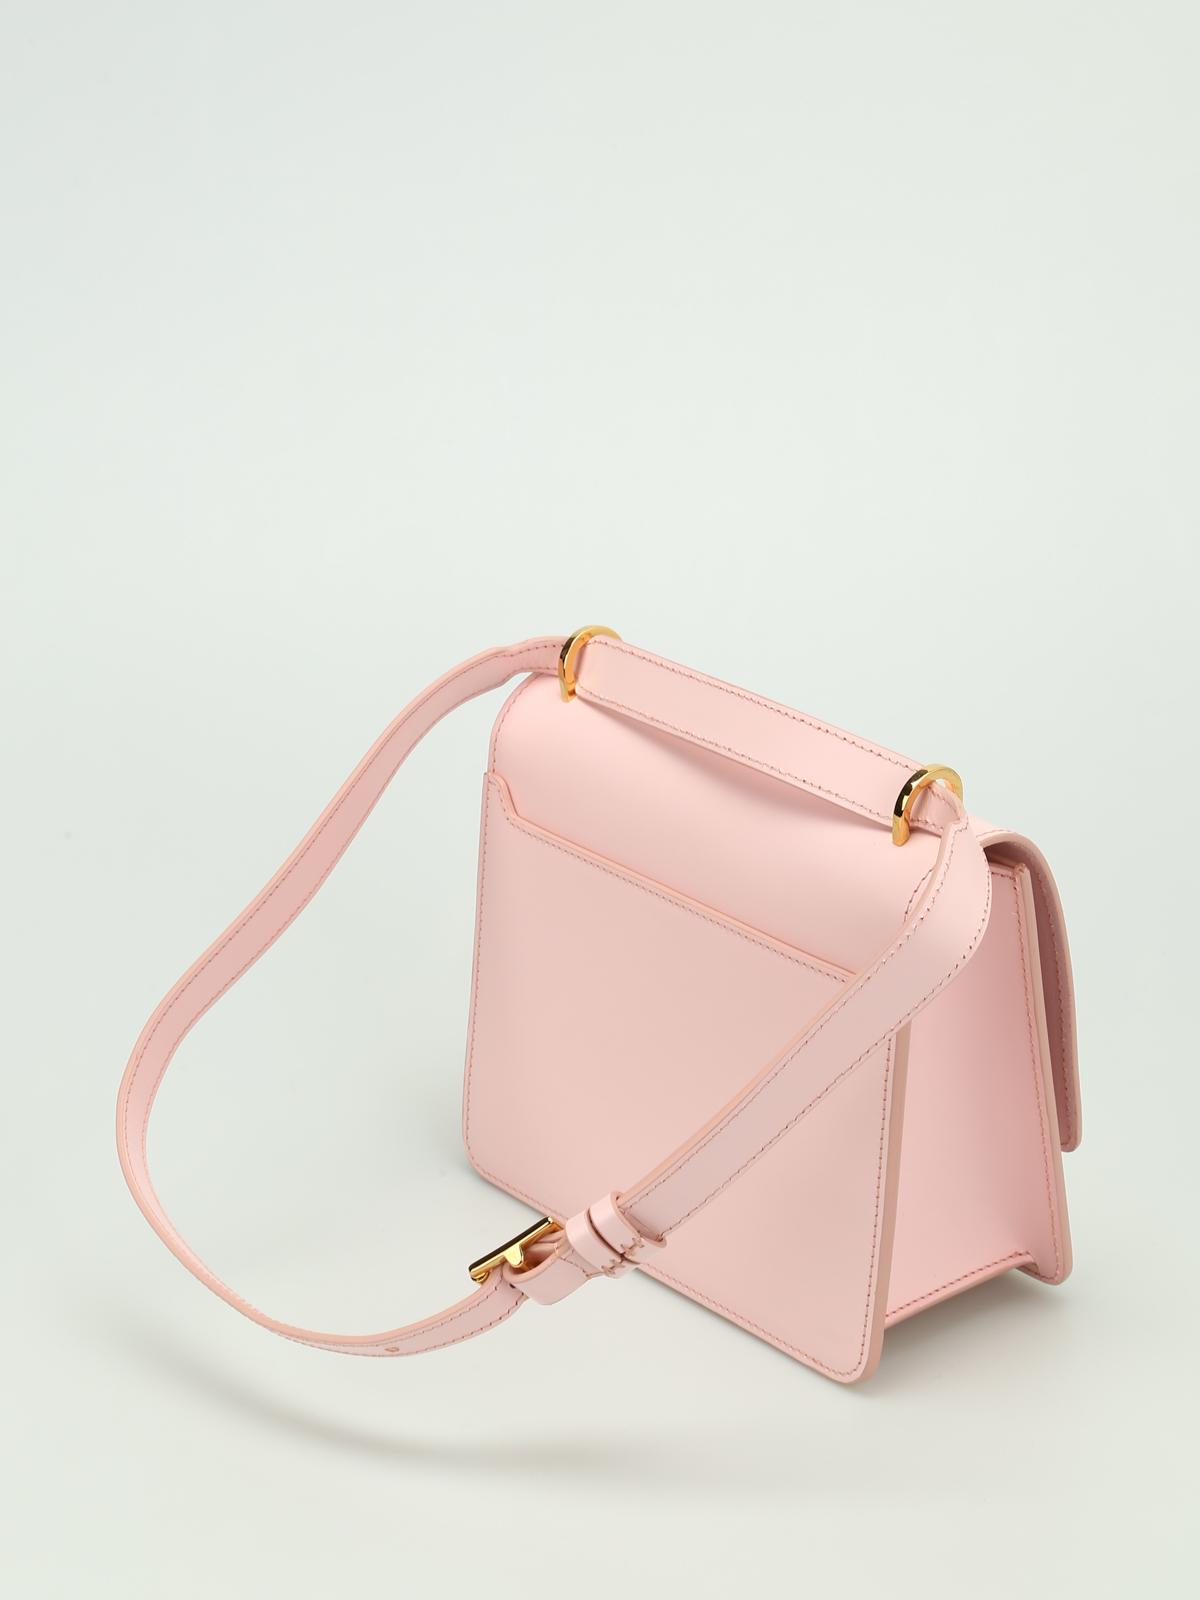 Sophie Hulme - Medium Straw leather bag - shoulder bags - BG246LE ... e285ab0f8412e